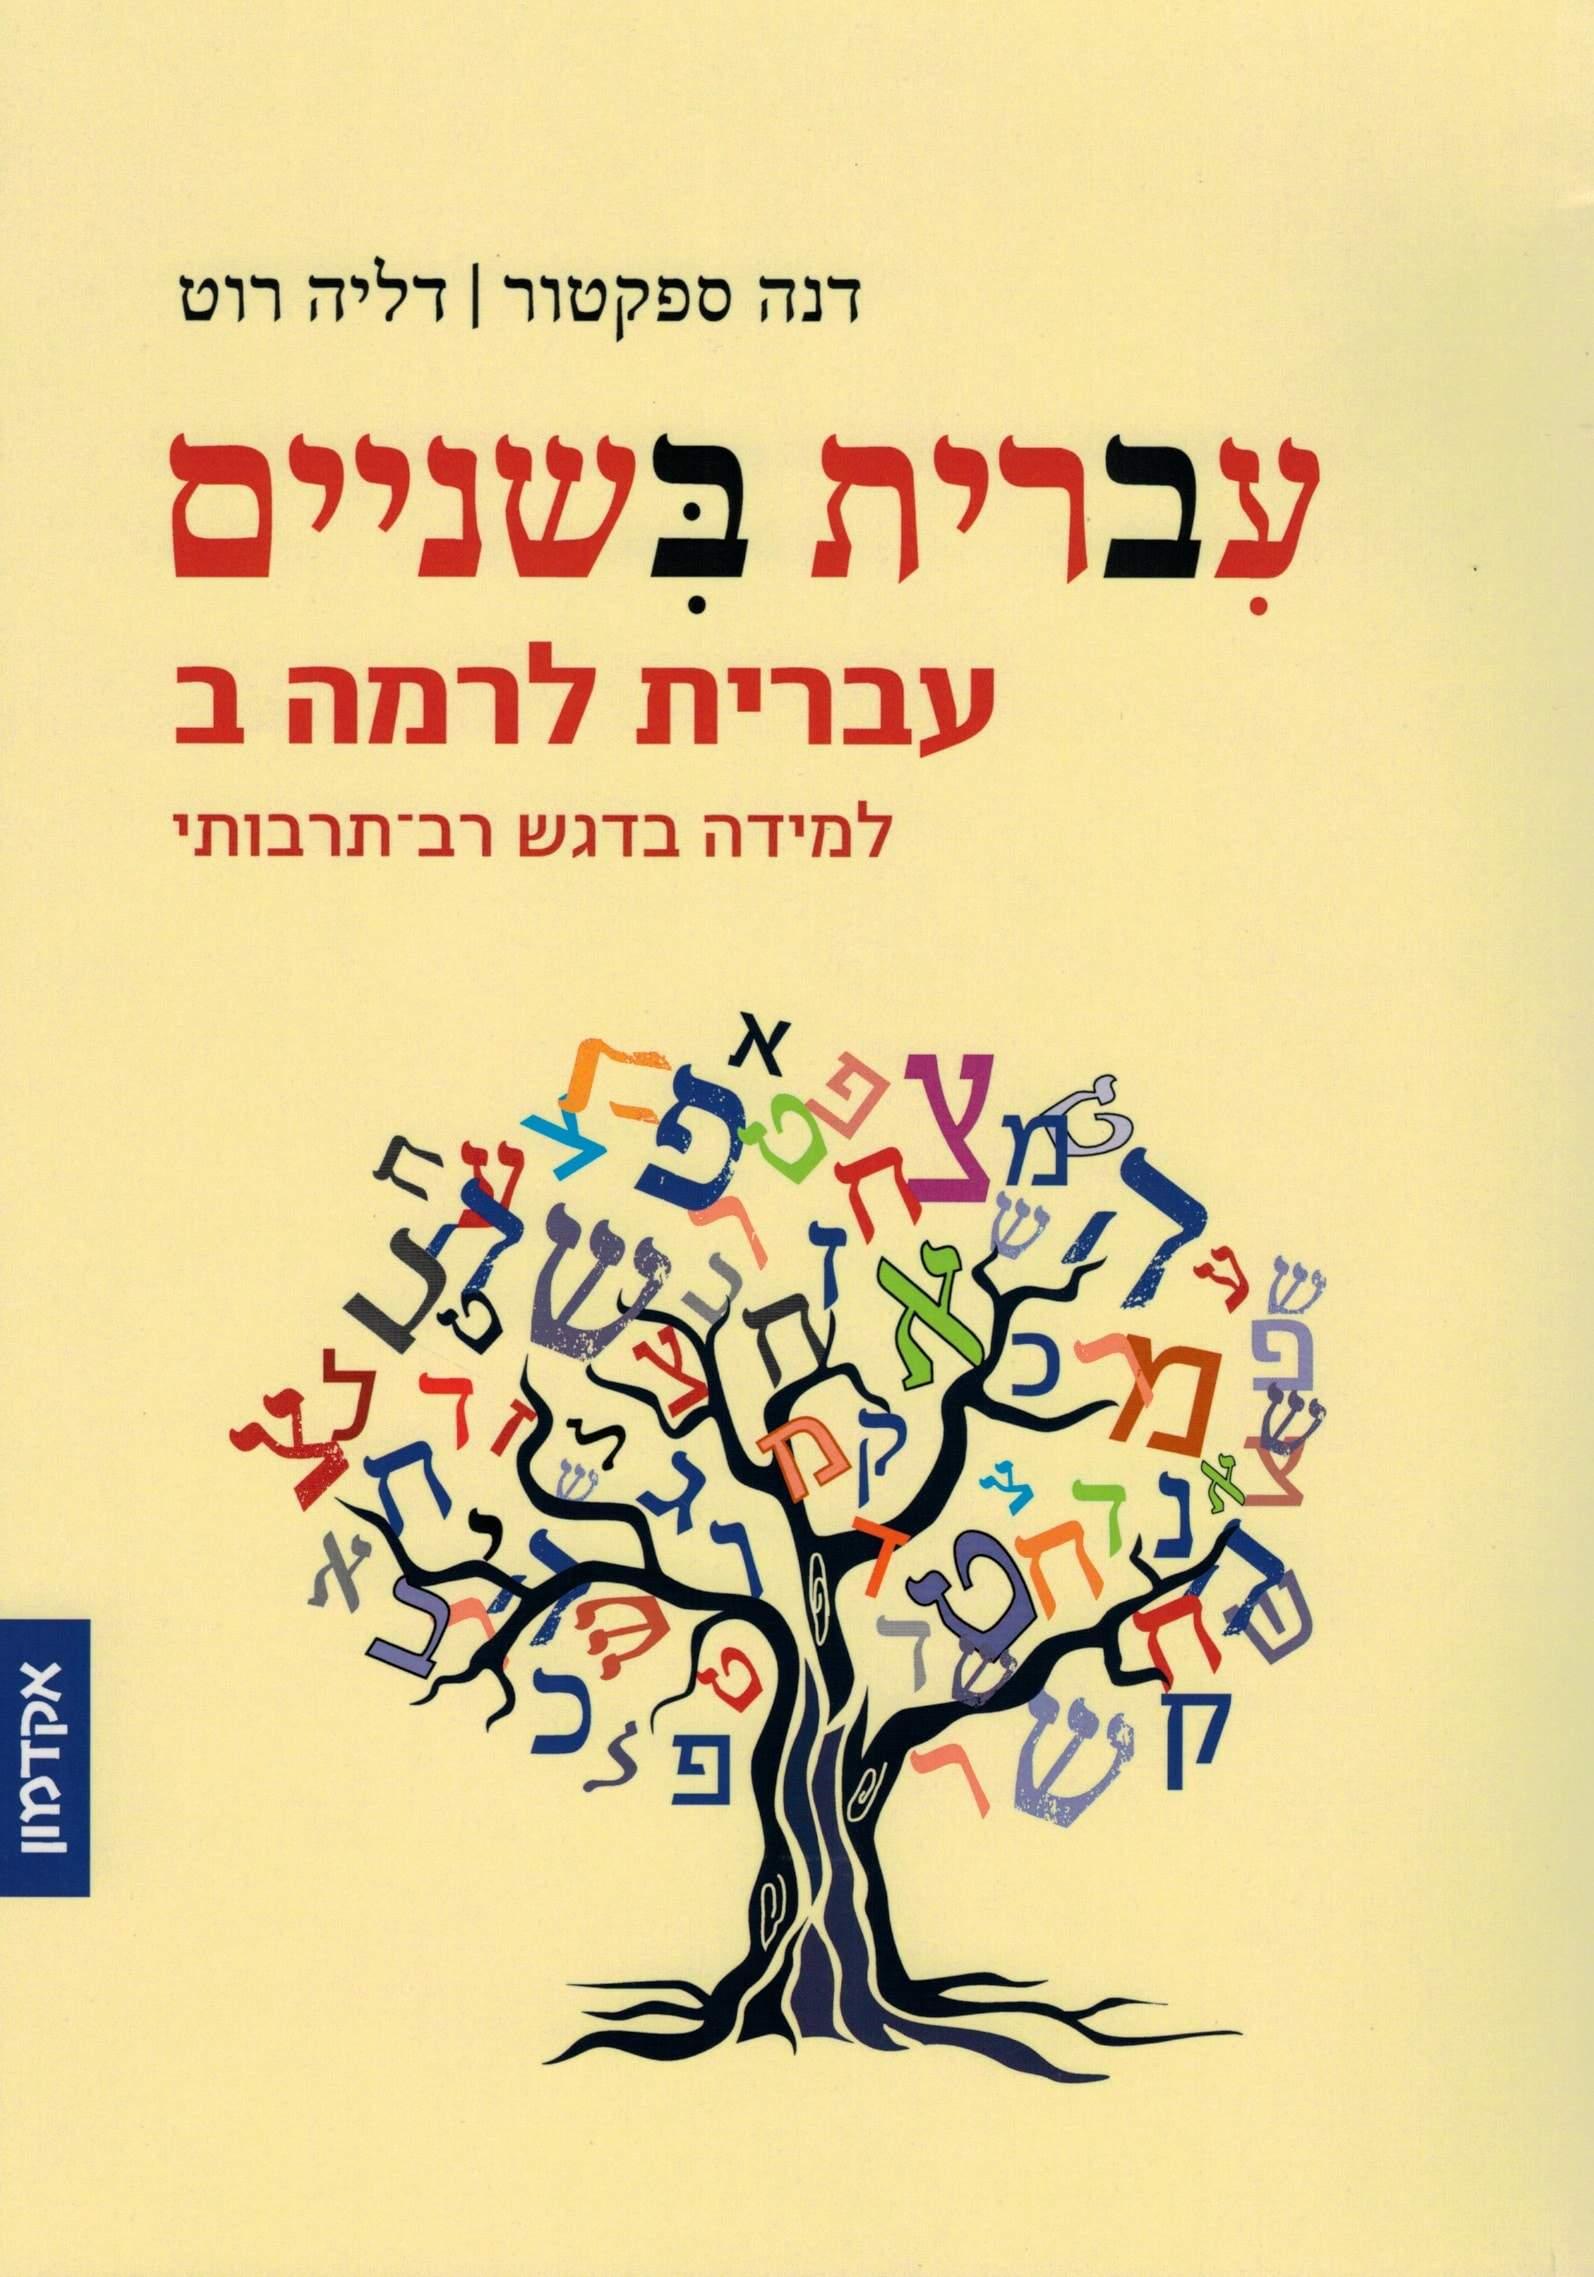 Hebrew: Take 2